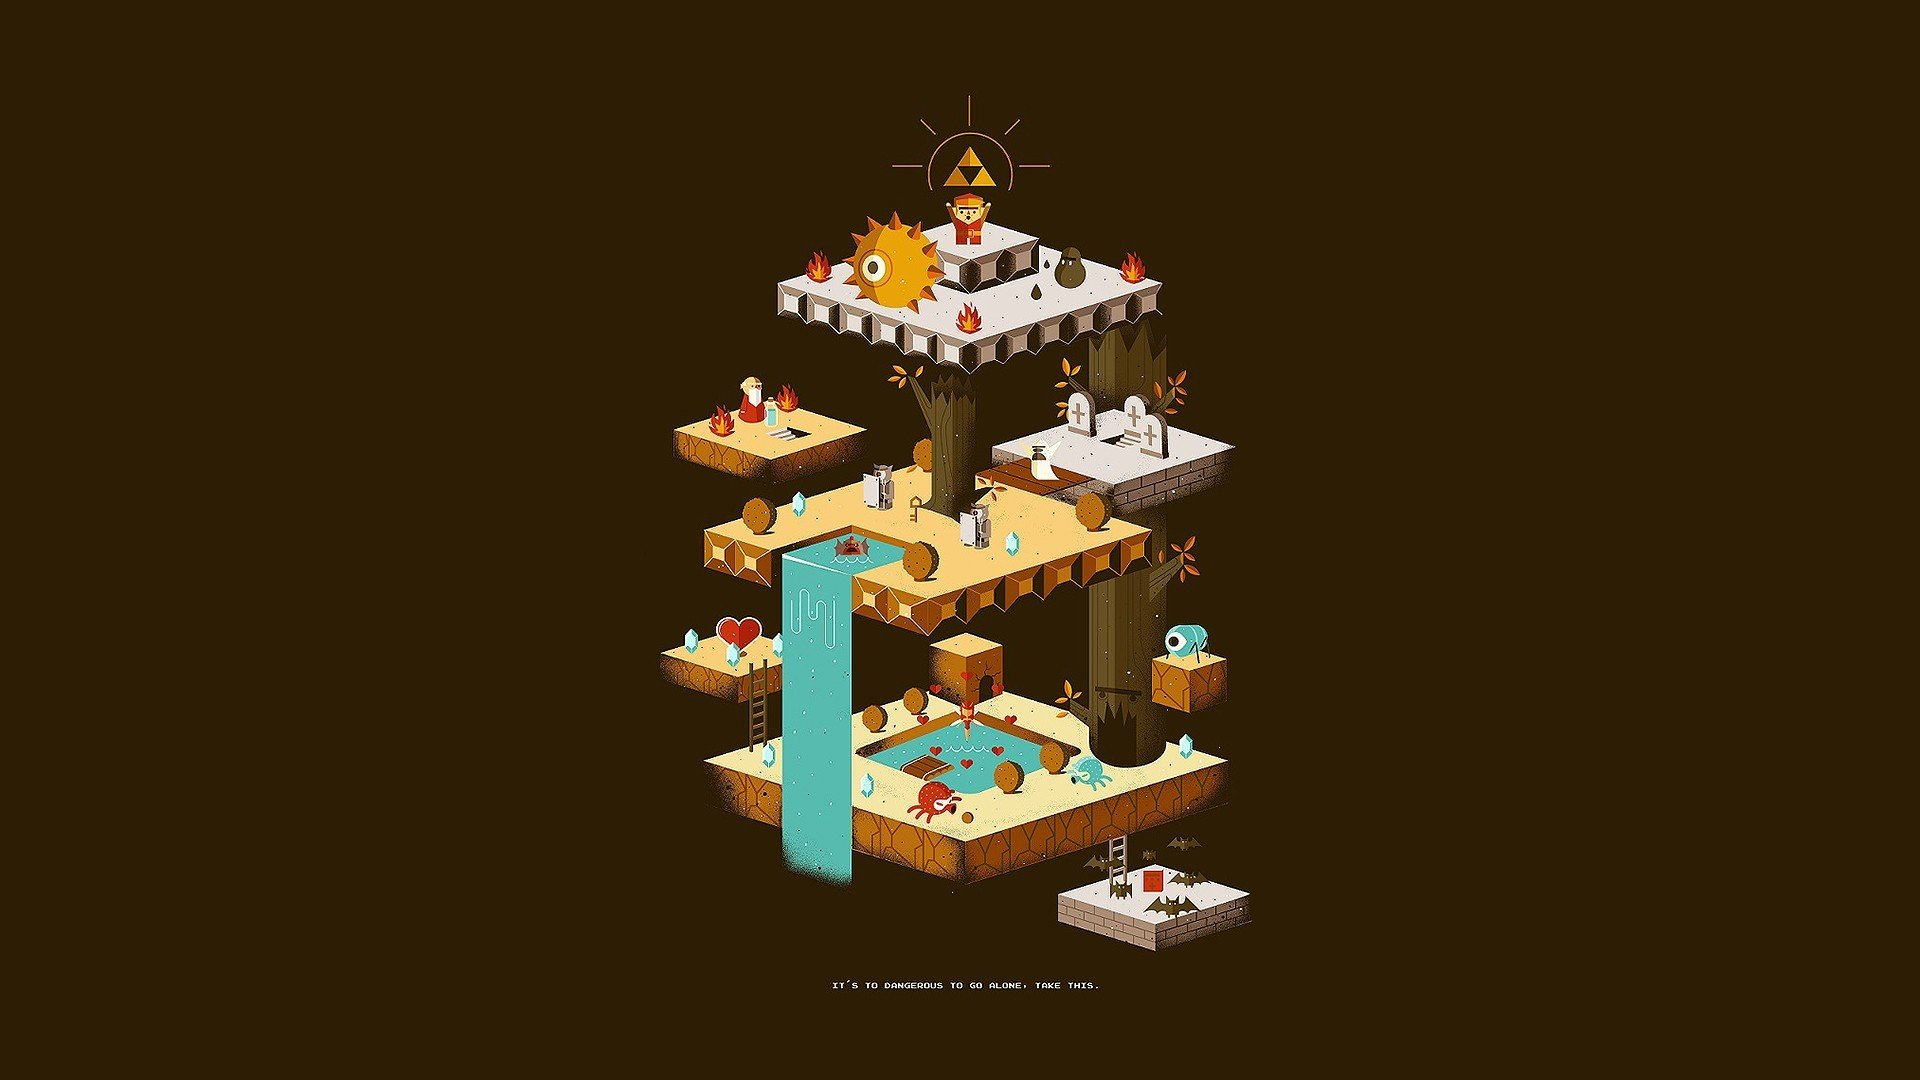 Retro Gaming wallpaper picture hd